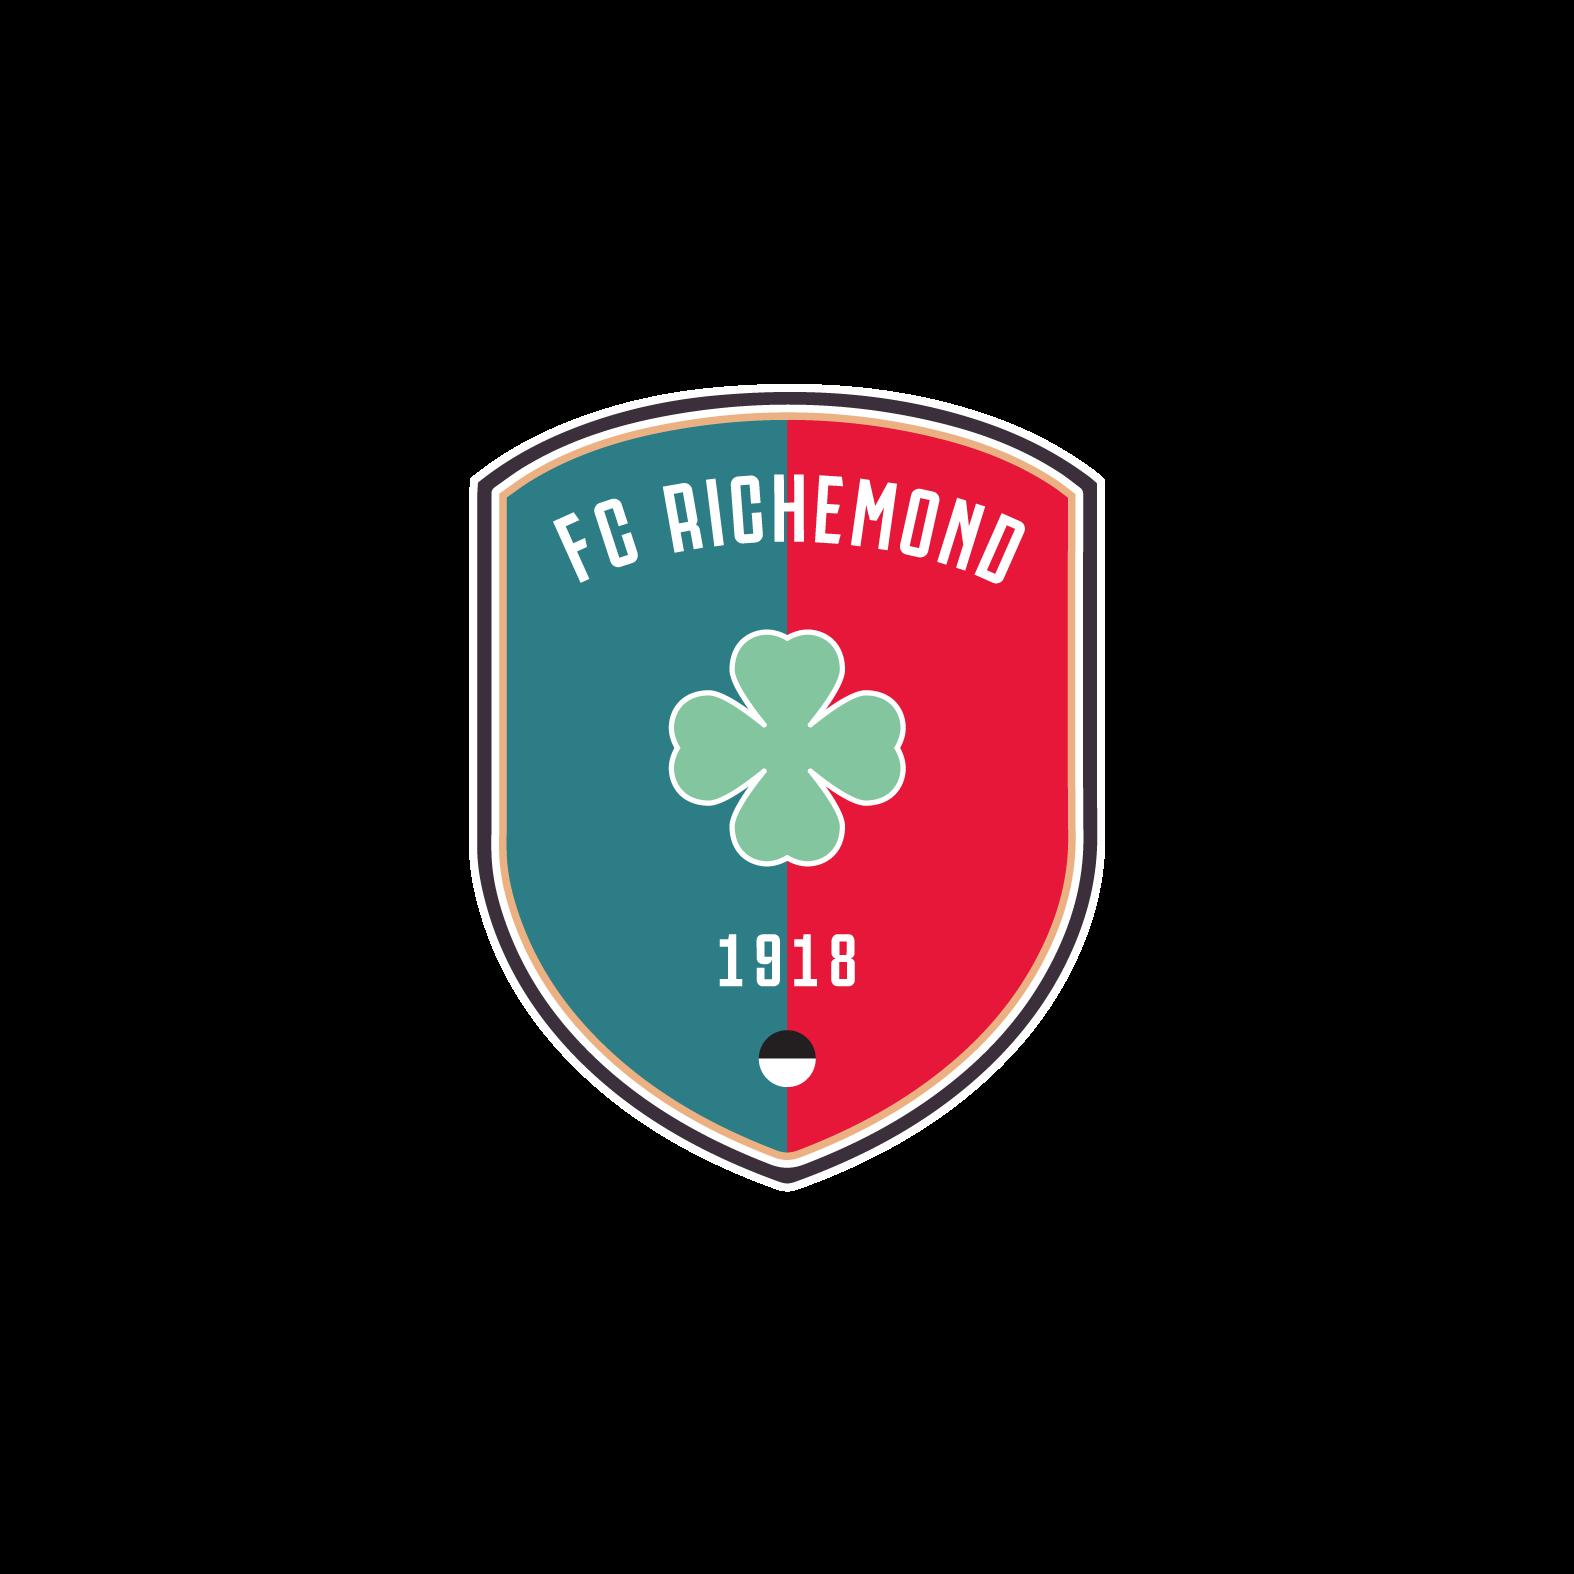 https://www.fcrichemond.ch/wp-content/uploads/2019/07/fcrichemond-logo-2019-carre1.png